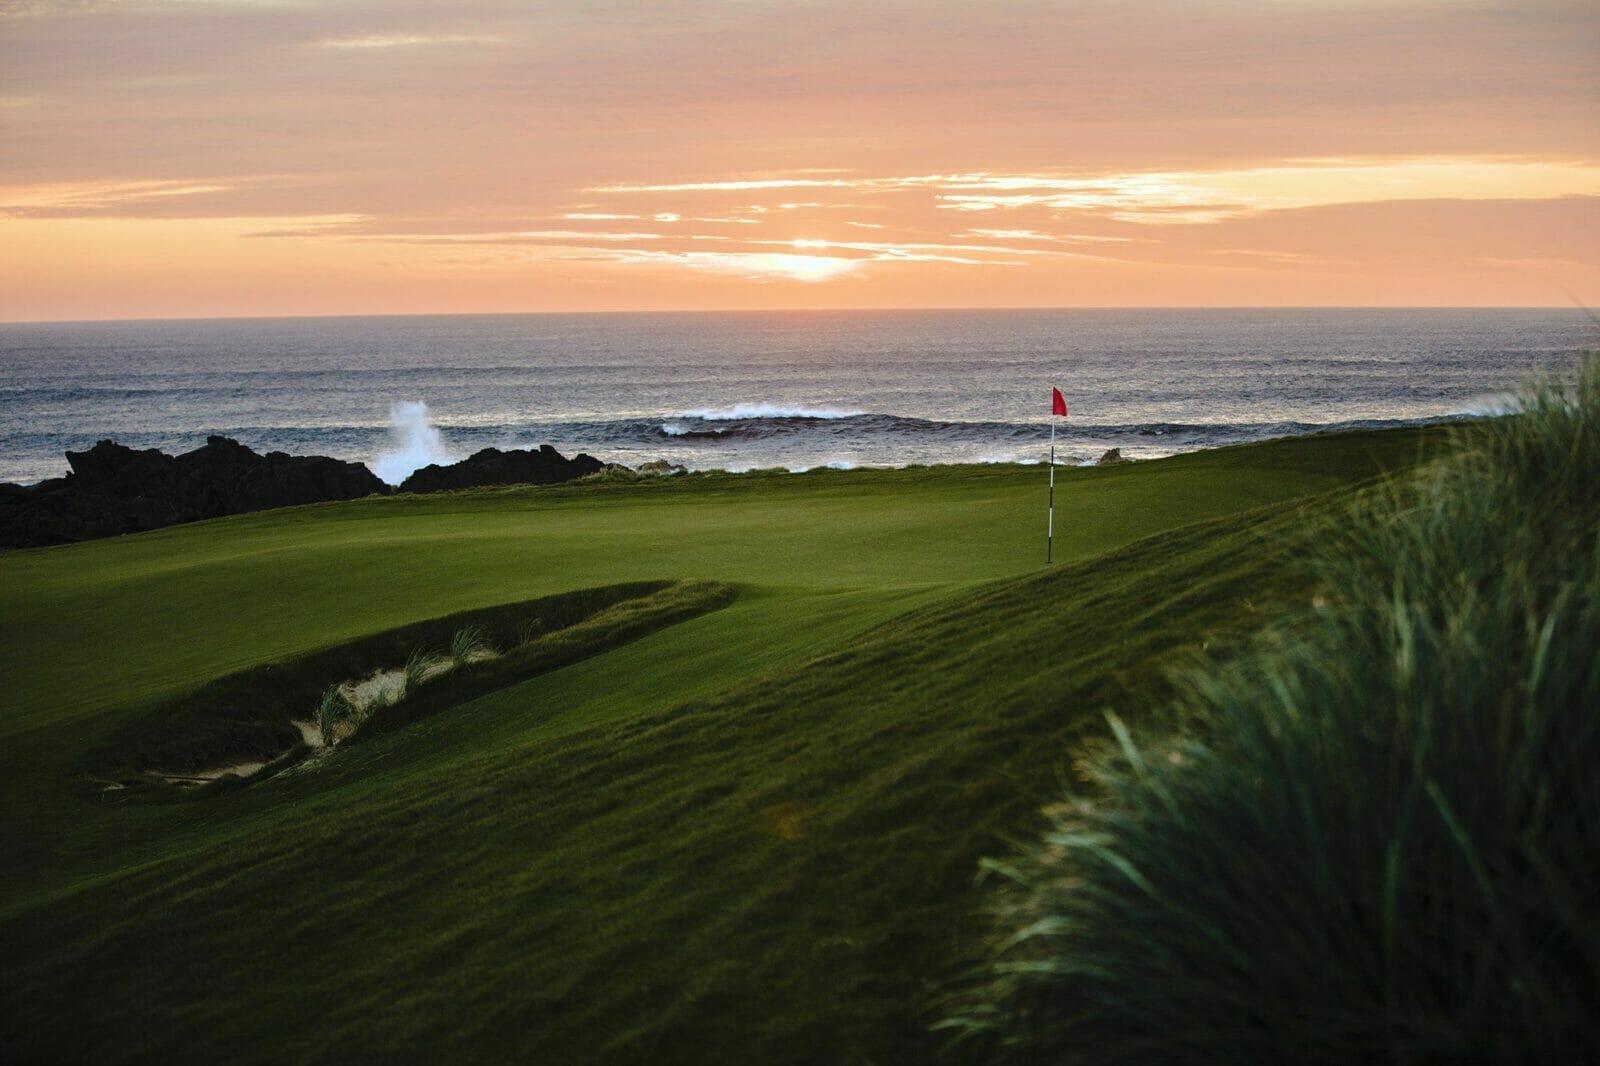 Sunset over Cape Wickham Links